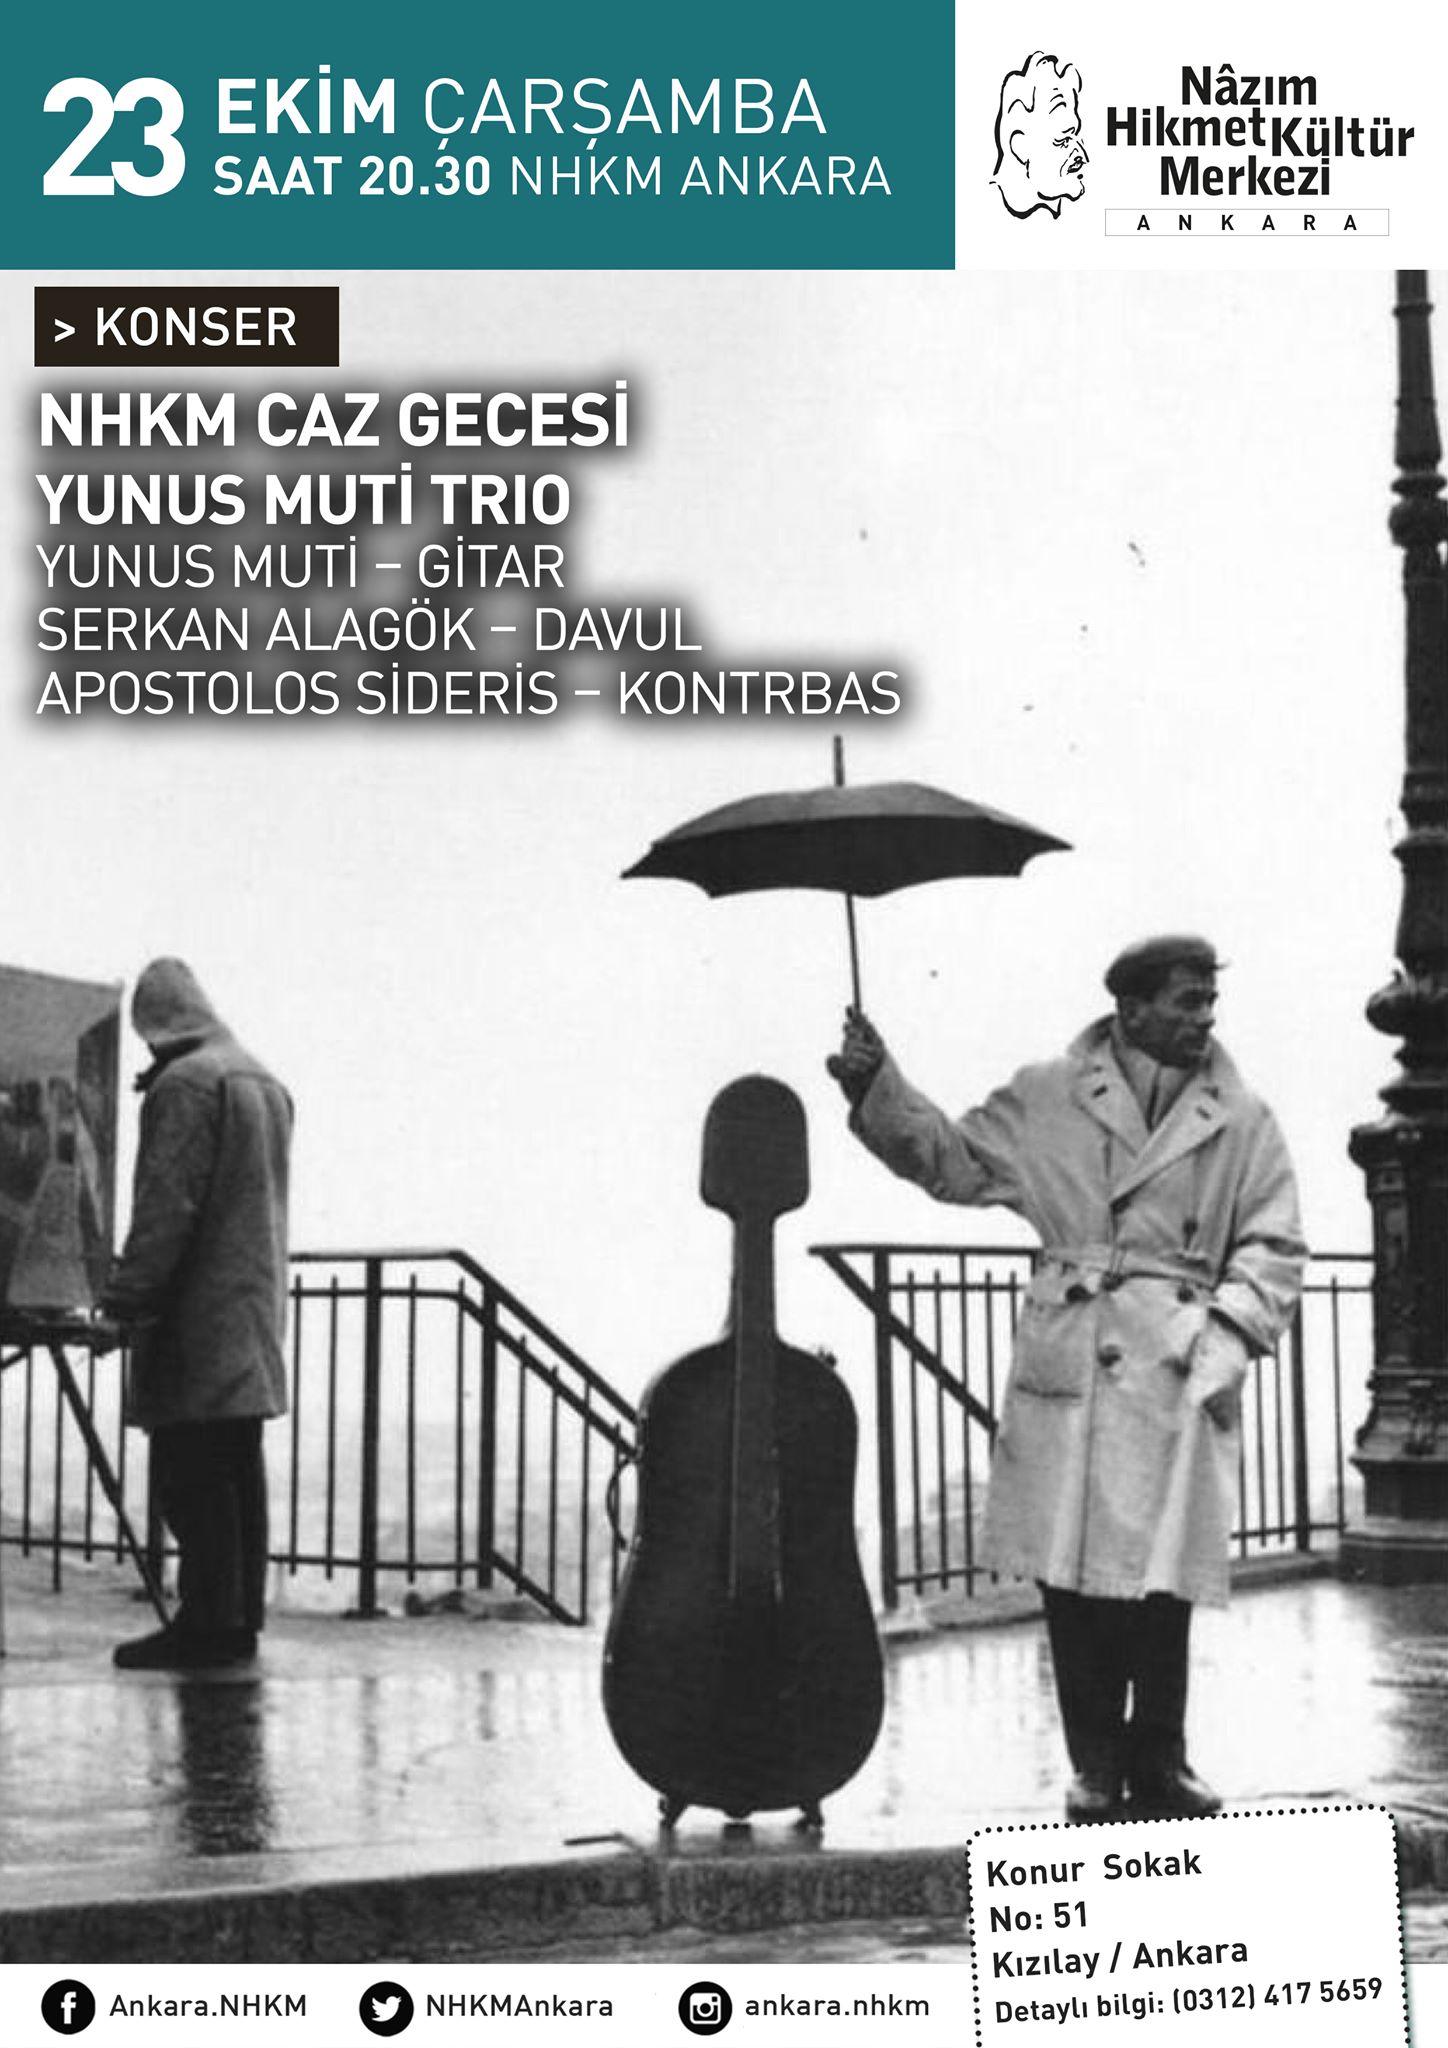 NHKM Caz Gecesi: Yunus Muti Trio